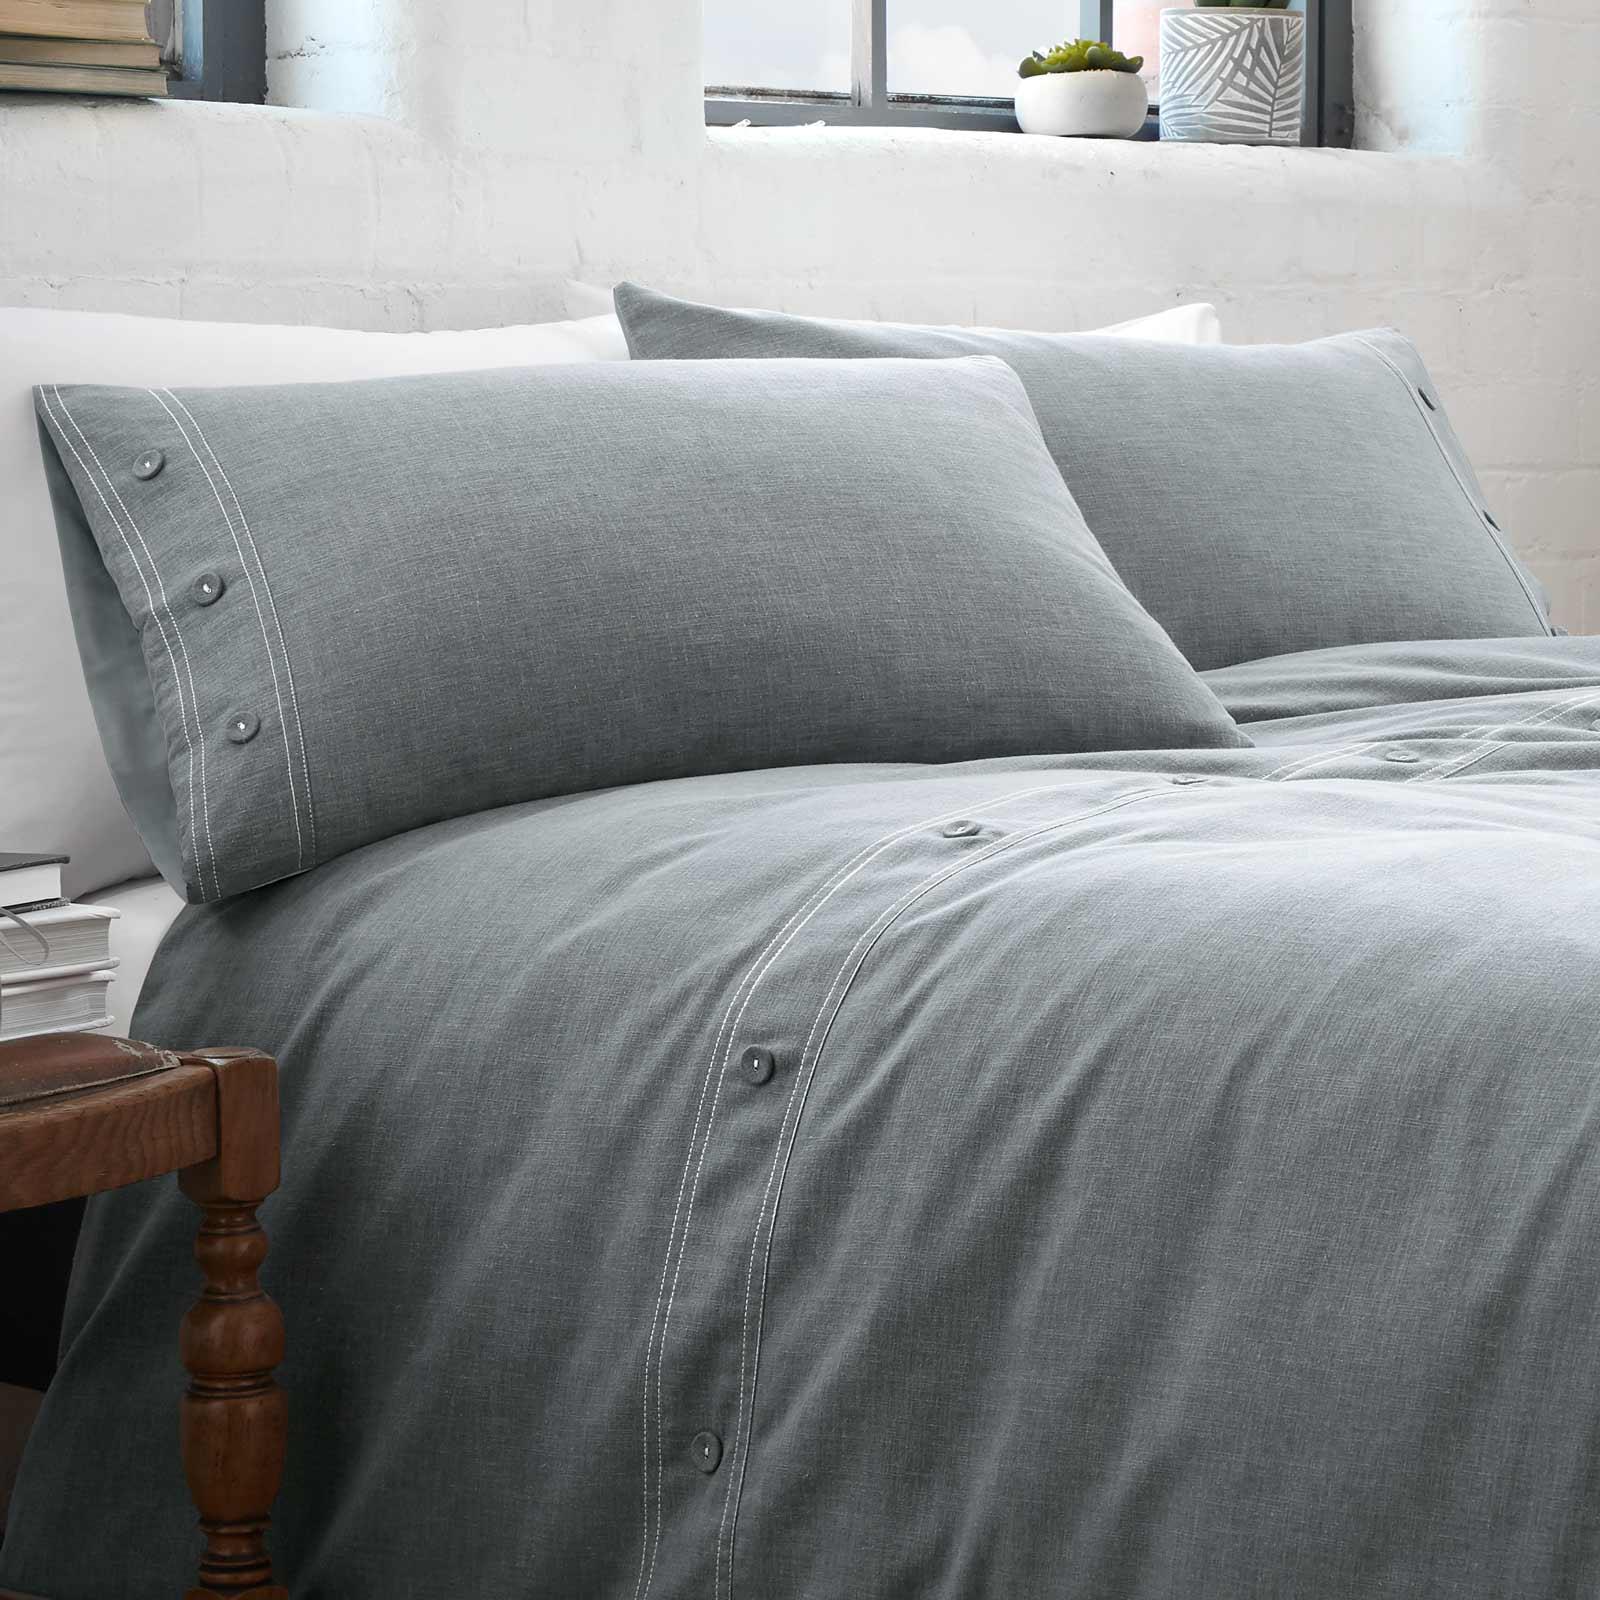 Azul-fundas-nordicas-Denim-Chambray-Boton-Detalle-de-lujo-cubierta-del-edredon-conjuntos-de-cama miniatura 14